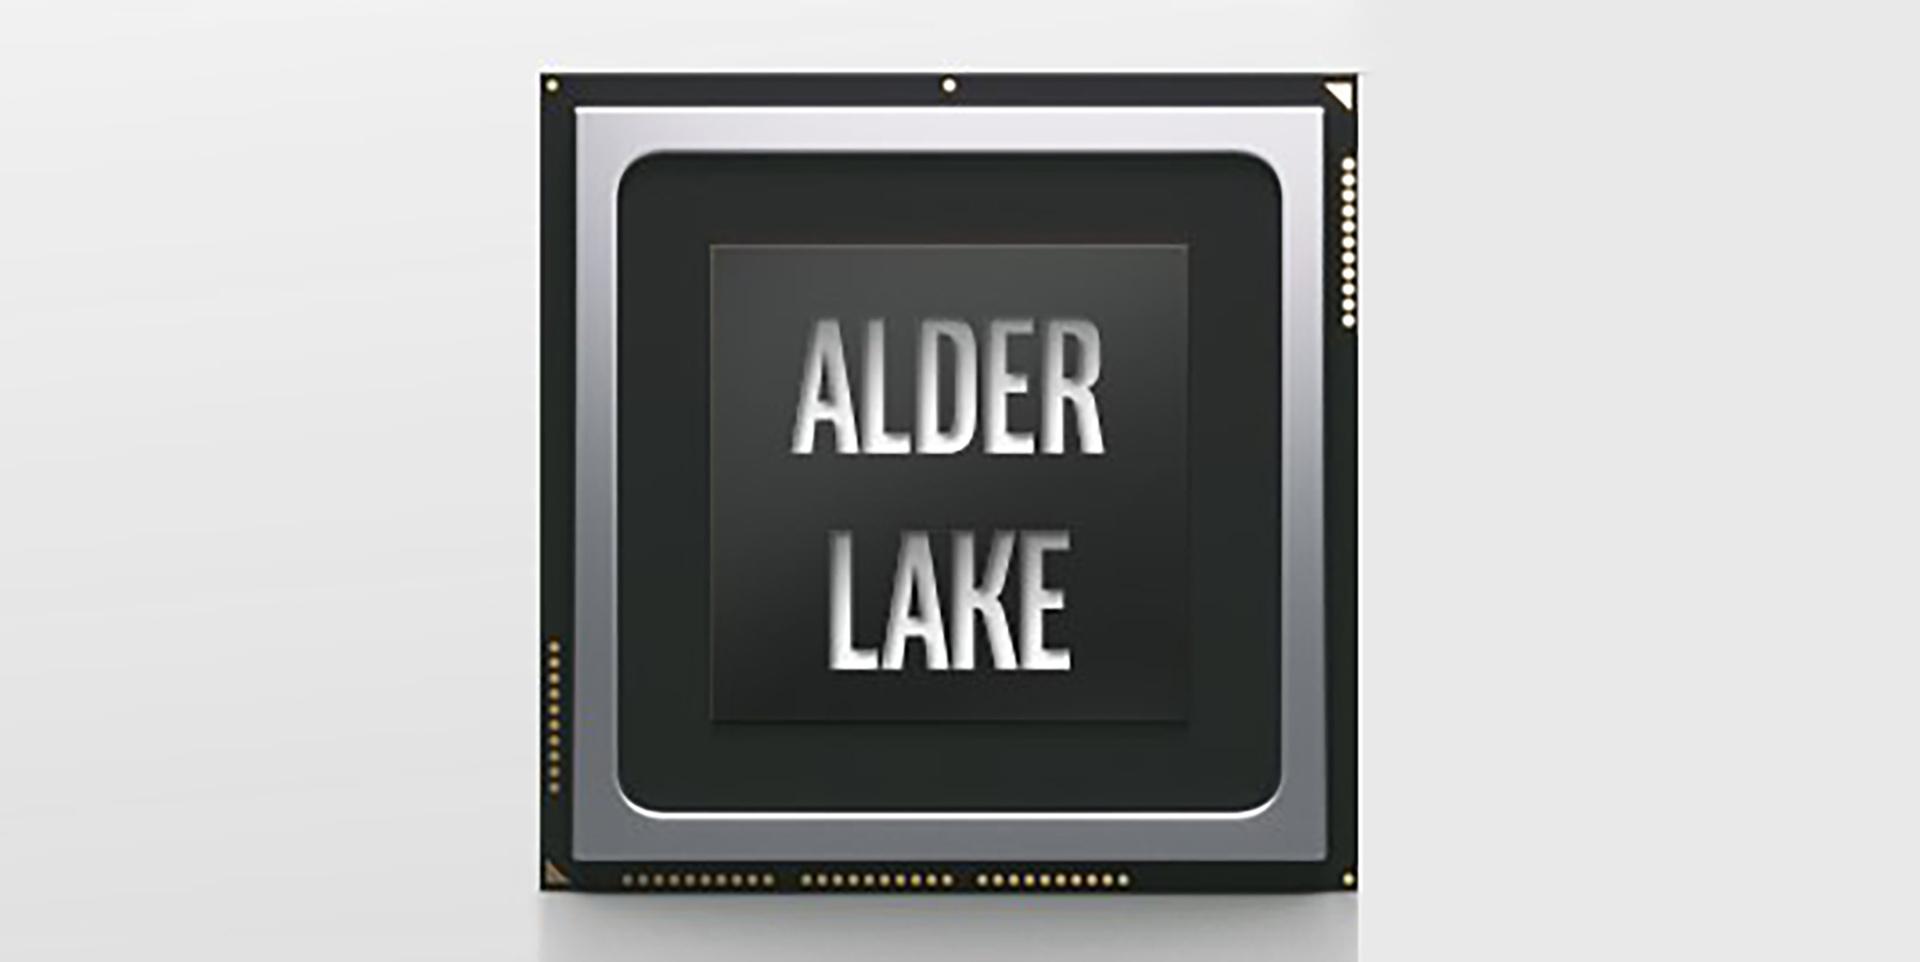 Intel's next-gen 16-core/32-thread Alder Lake chip appears online